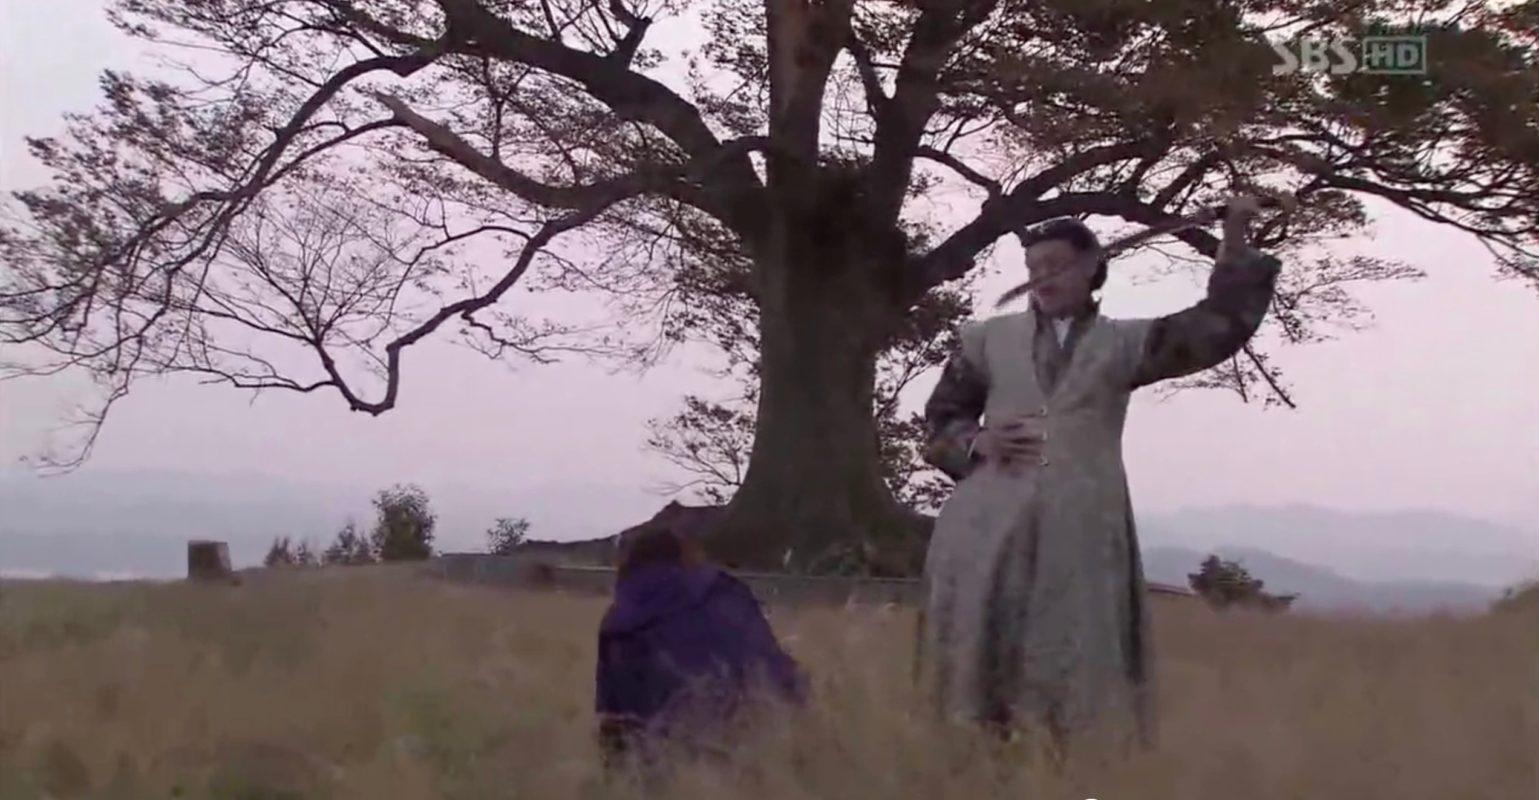 Mt. Seongheungsan Love Tree [성흥산 사랑나무] – Korean Dramaland